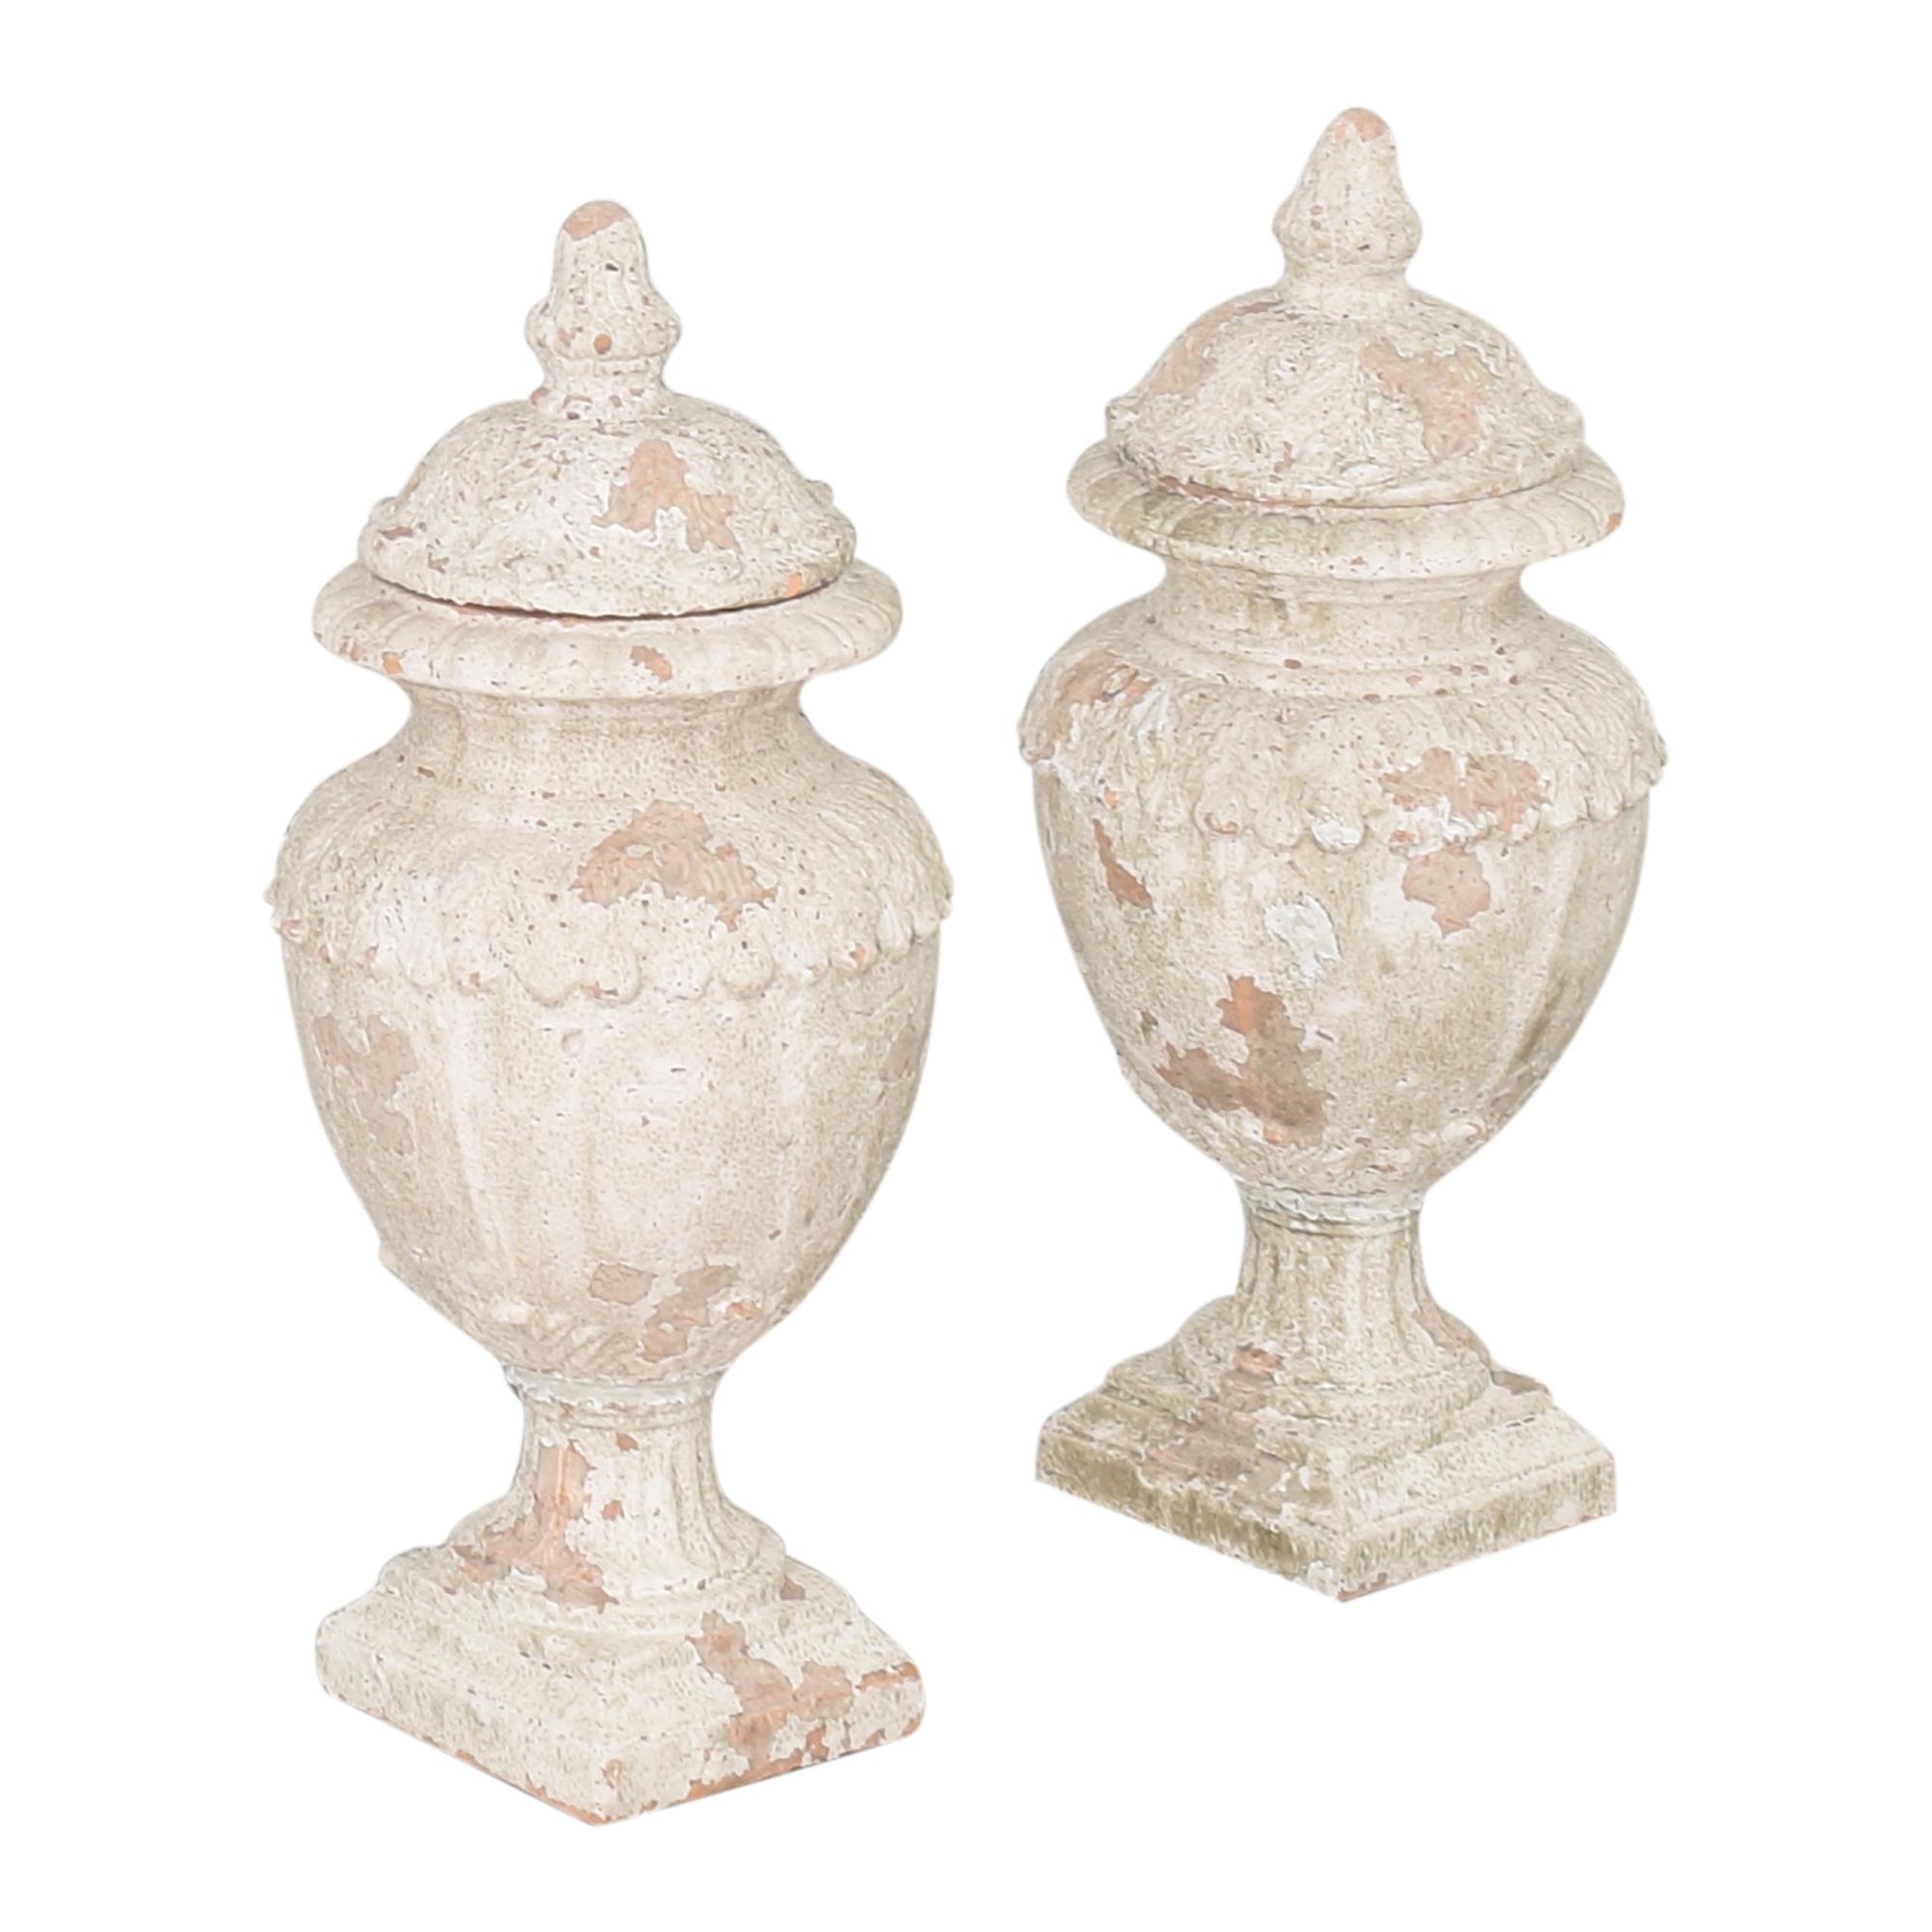 Decorative Distressed Urns / Decorative Accents